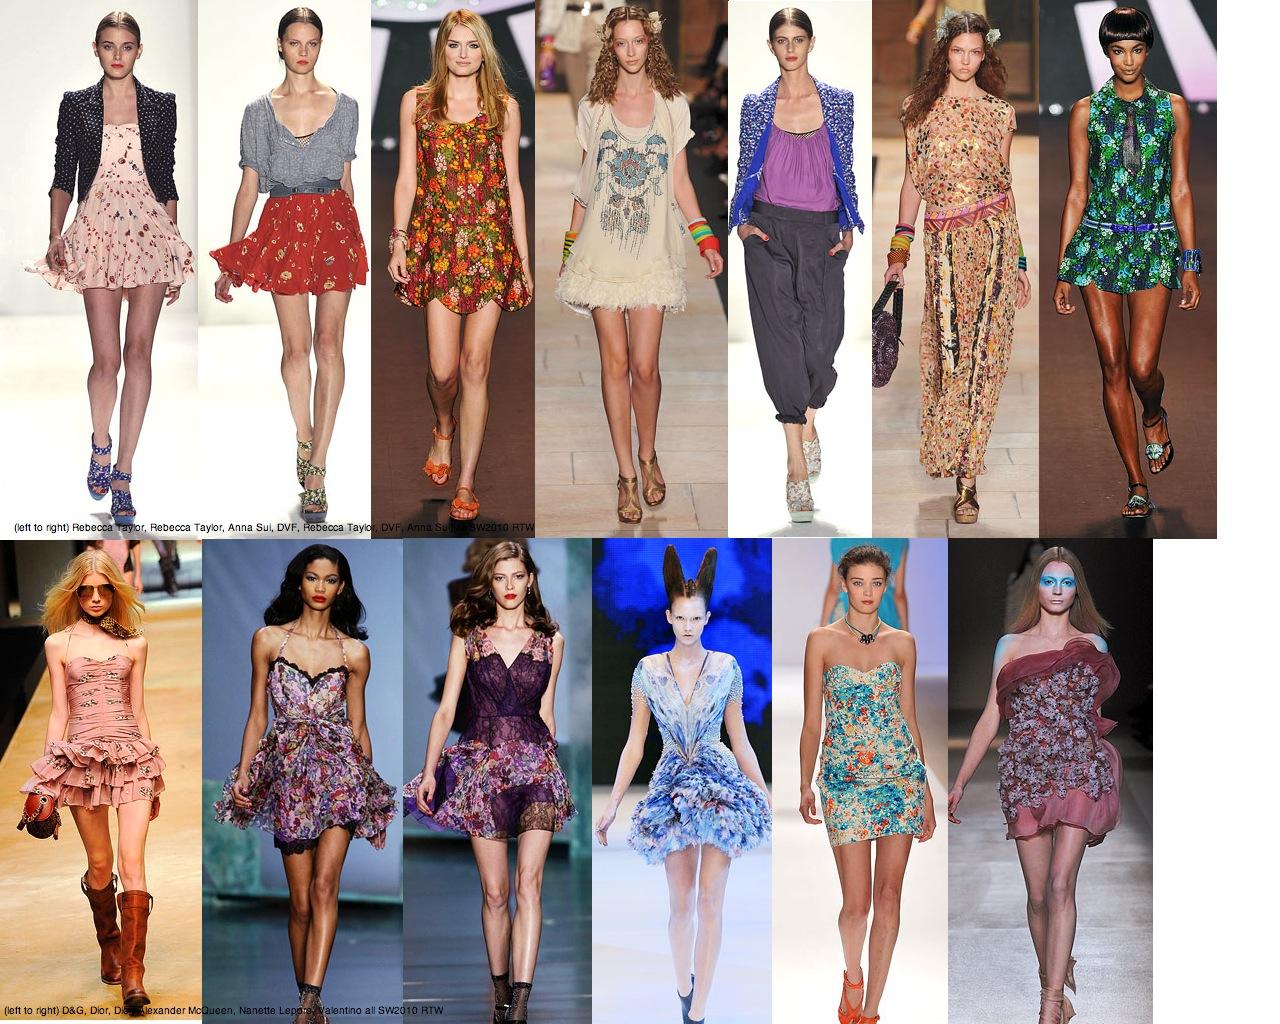 http://www.google.com/imgres?um=1&hl=en&biw=1546&bih=849&tbm=isch&tbnid=3FcB16Z6m2rhkM:&imgrefurl=http://phemonanand.blogspot.com/2010/03/flower-power.html&docid=As16a63IPIvo5M&imgurl=http://4.bp.blogspot.com/_Vb63eUxhzeI/S7OxJs_whzI/AAAAAAAAAHI/nR8uY03a1q8/s1600/softfloralrunway.jpg&w=1280&h=1024&ei=0e4MT_jJIYfkiAKCnPX0Aw&zoom=1&iact=rc&dur=411&sig=106096847336239482094&page=4&tbnh=142&tbnw=177&start=102&ndsp=36&ved=1t:429,r:7,s:102&tx=102&ty=58